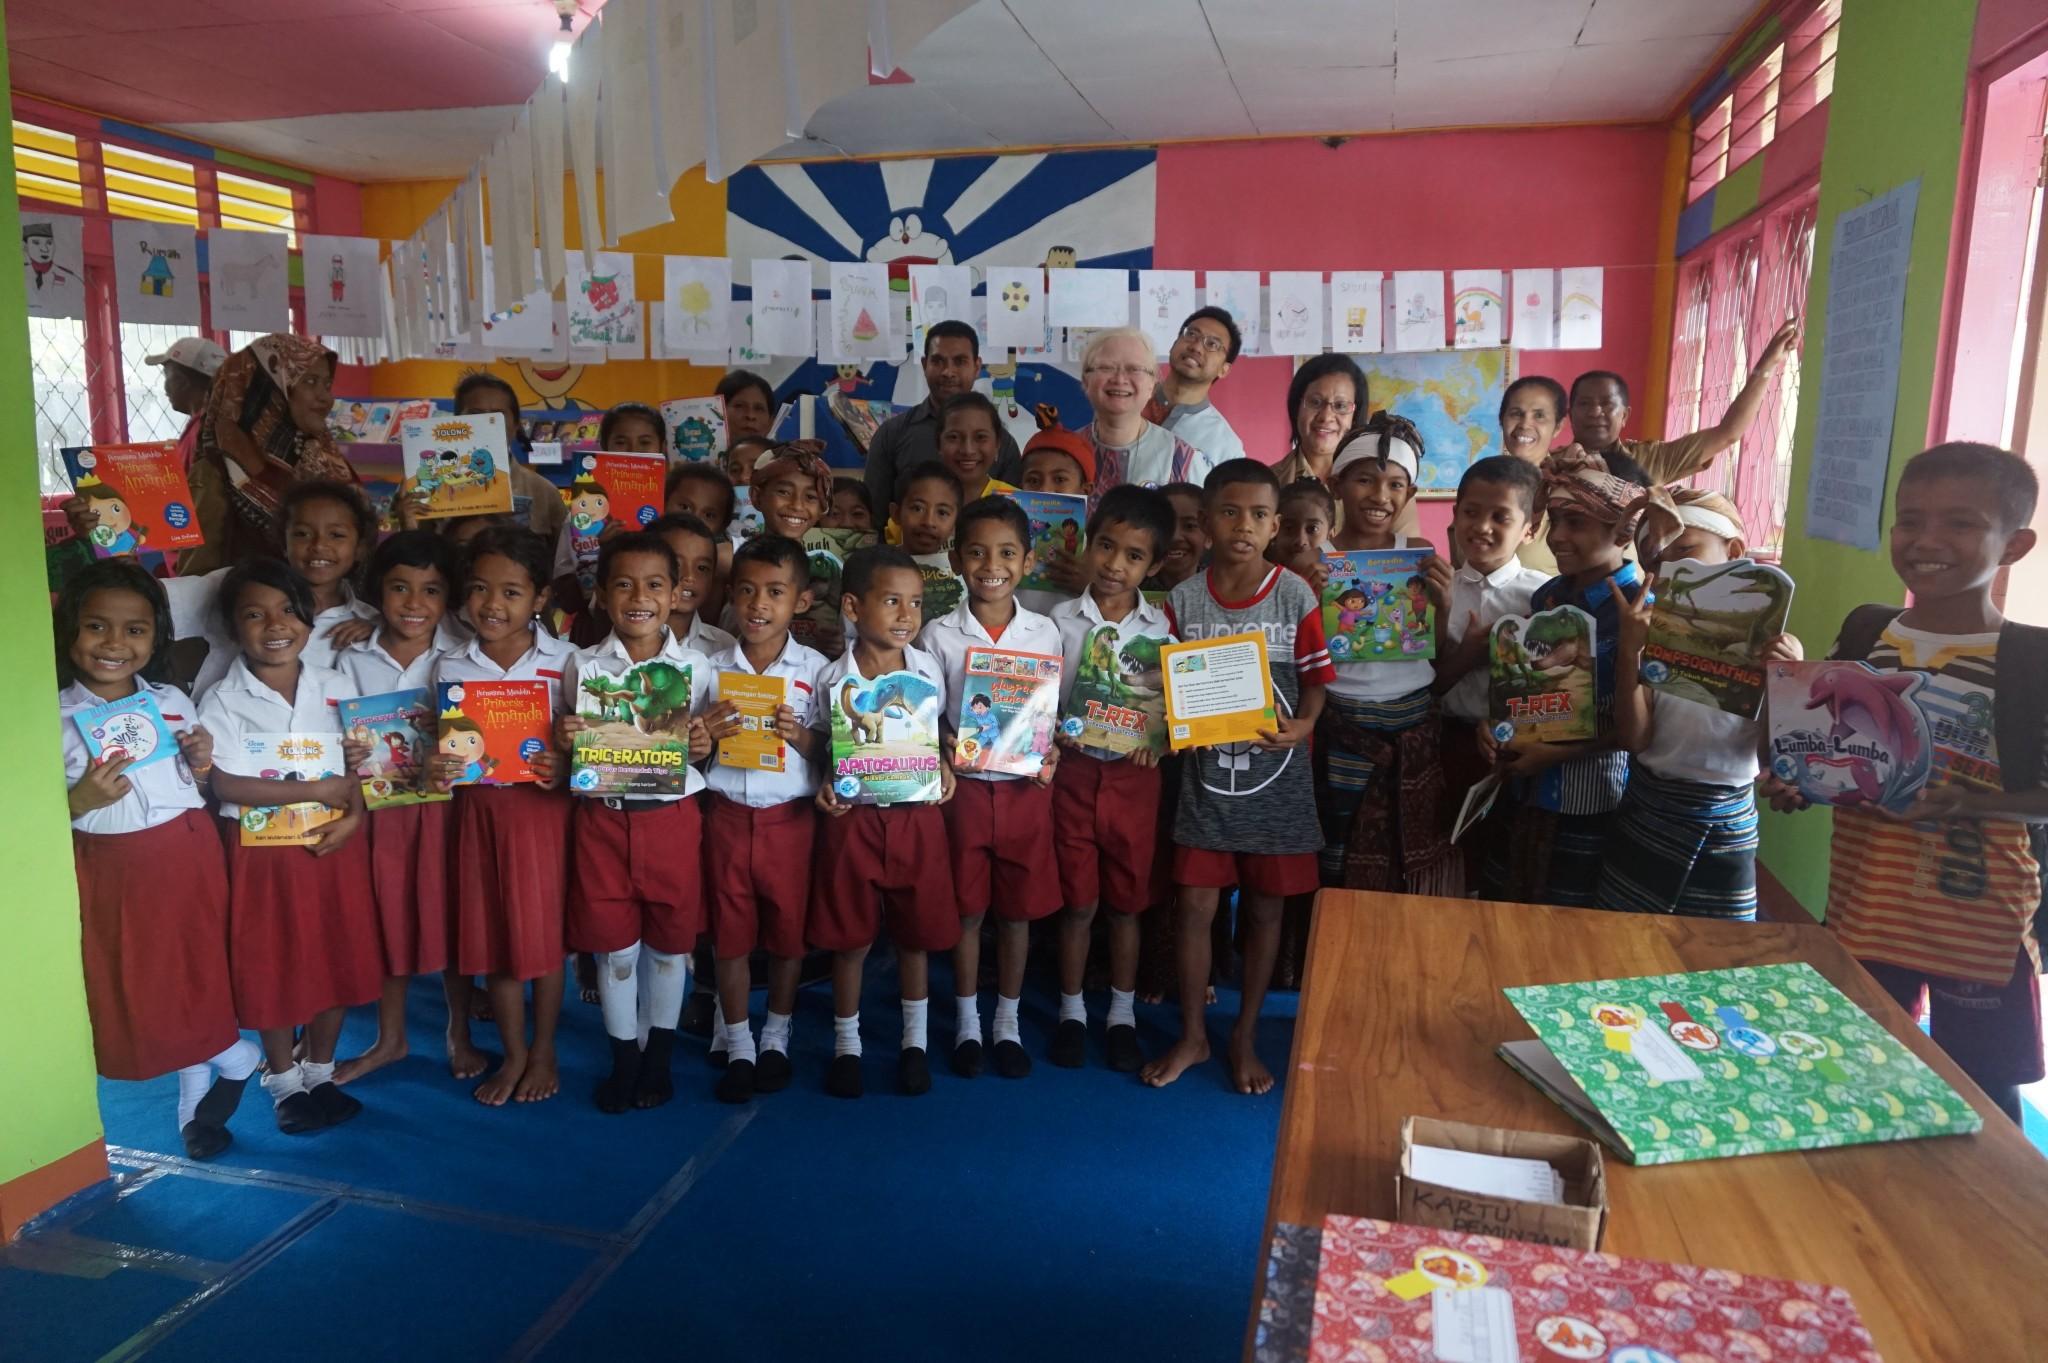 Peresmian Perpustakaan Taman Bacaan Pelangi Ke 86 di SD Inpres Ndona 4 Ende Flores NTT Taman Bacaan Pelangi [Rainbow Reading Gardens]